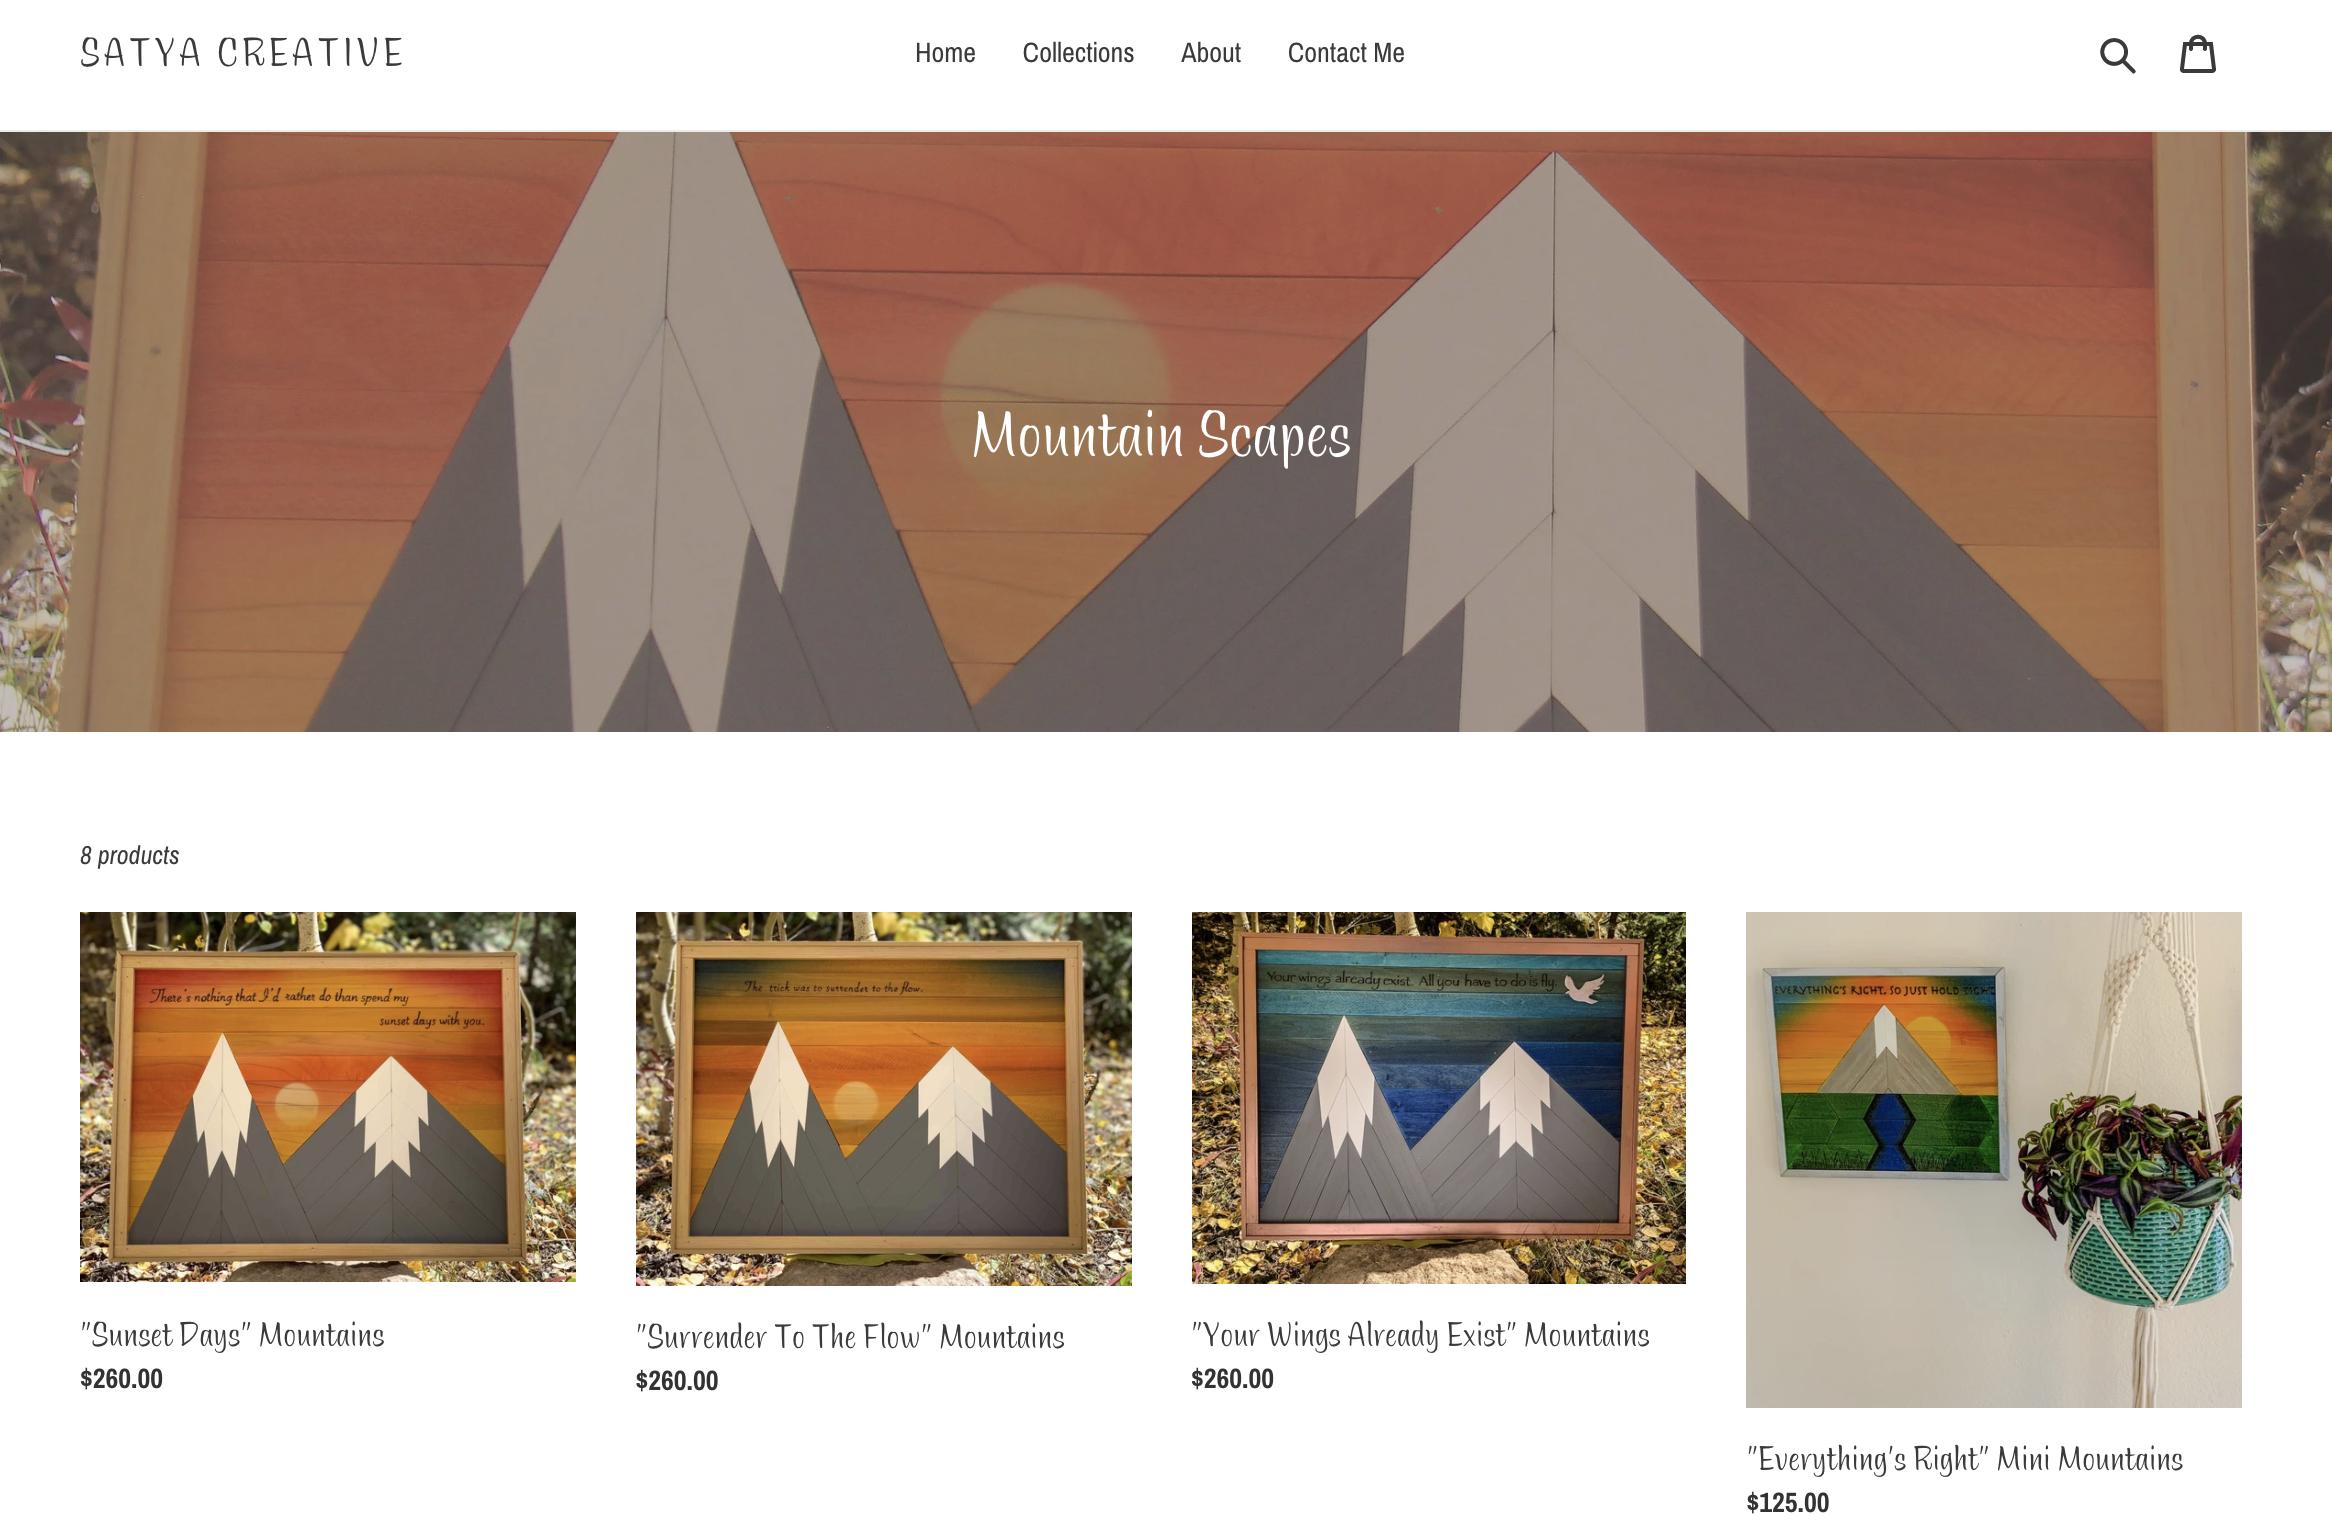 Satya Creative Website